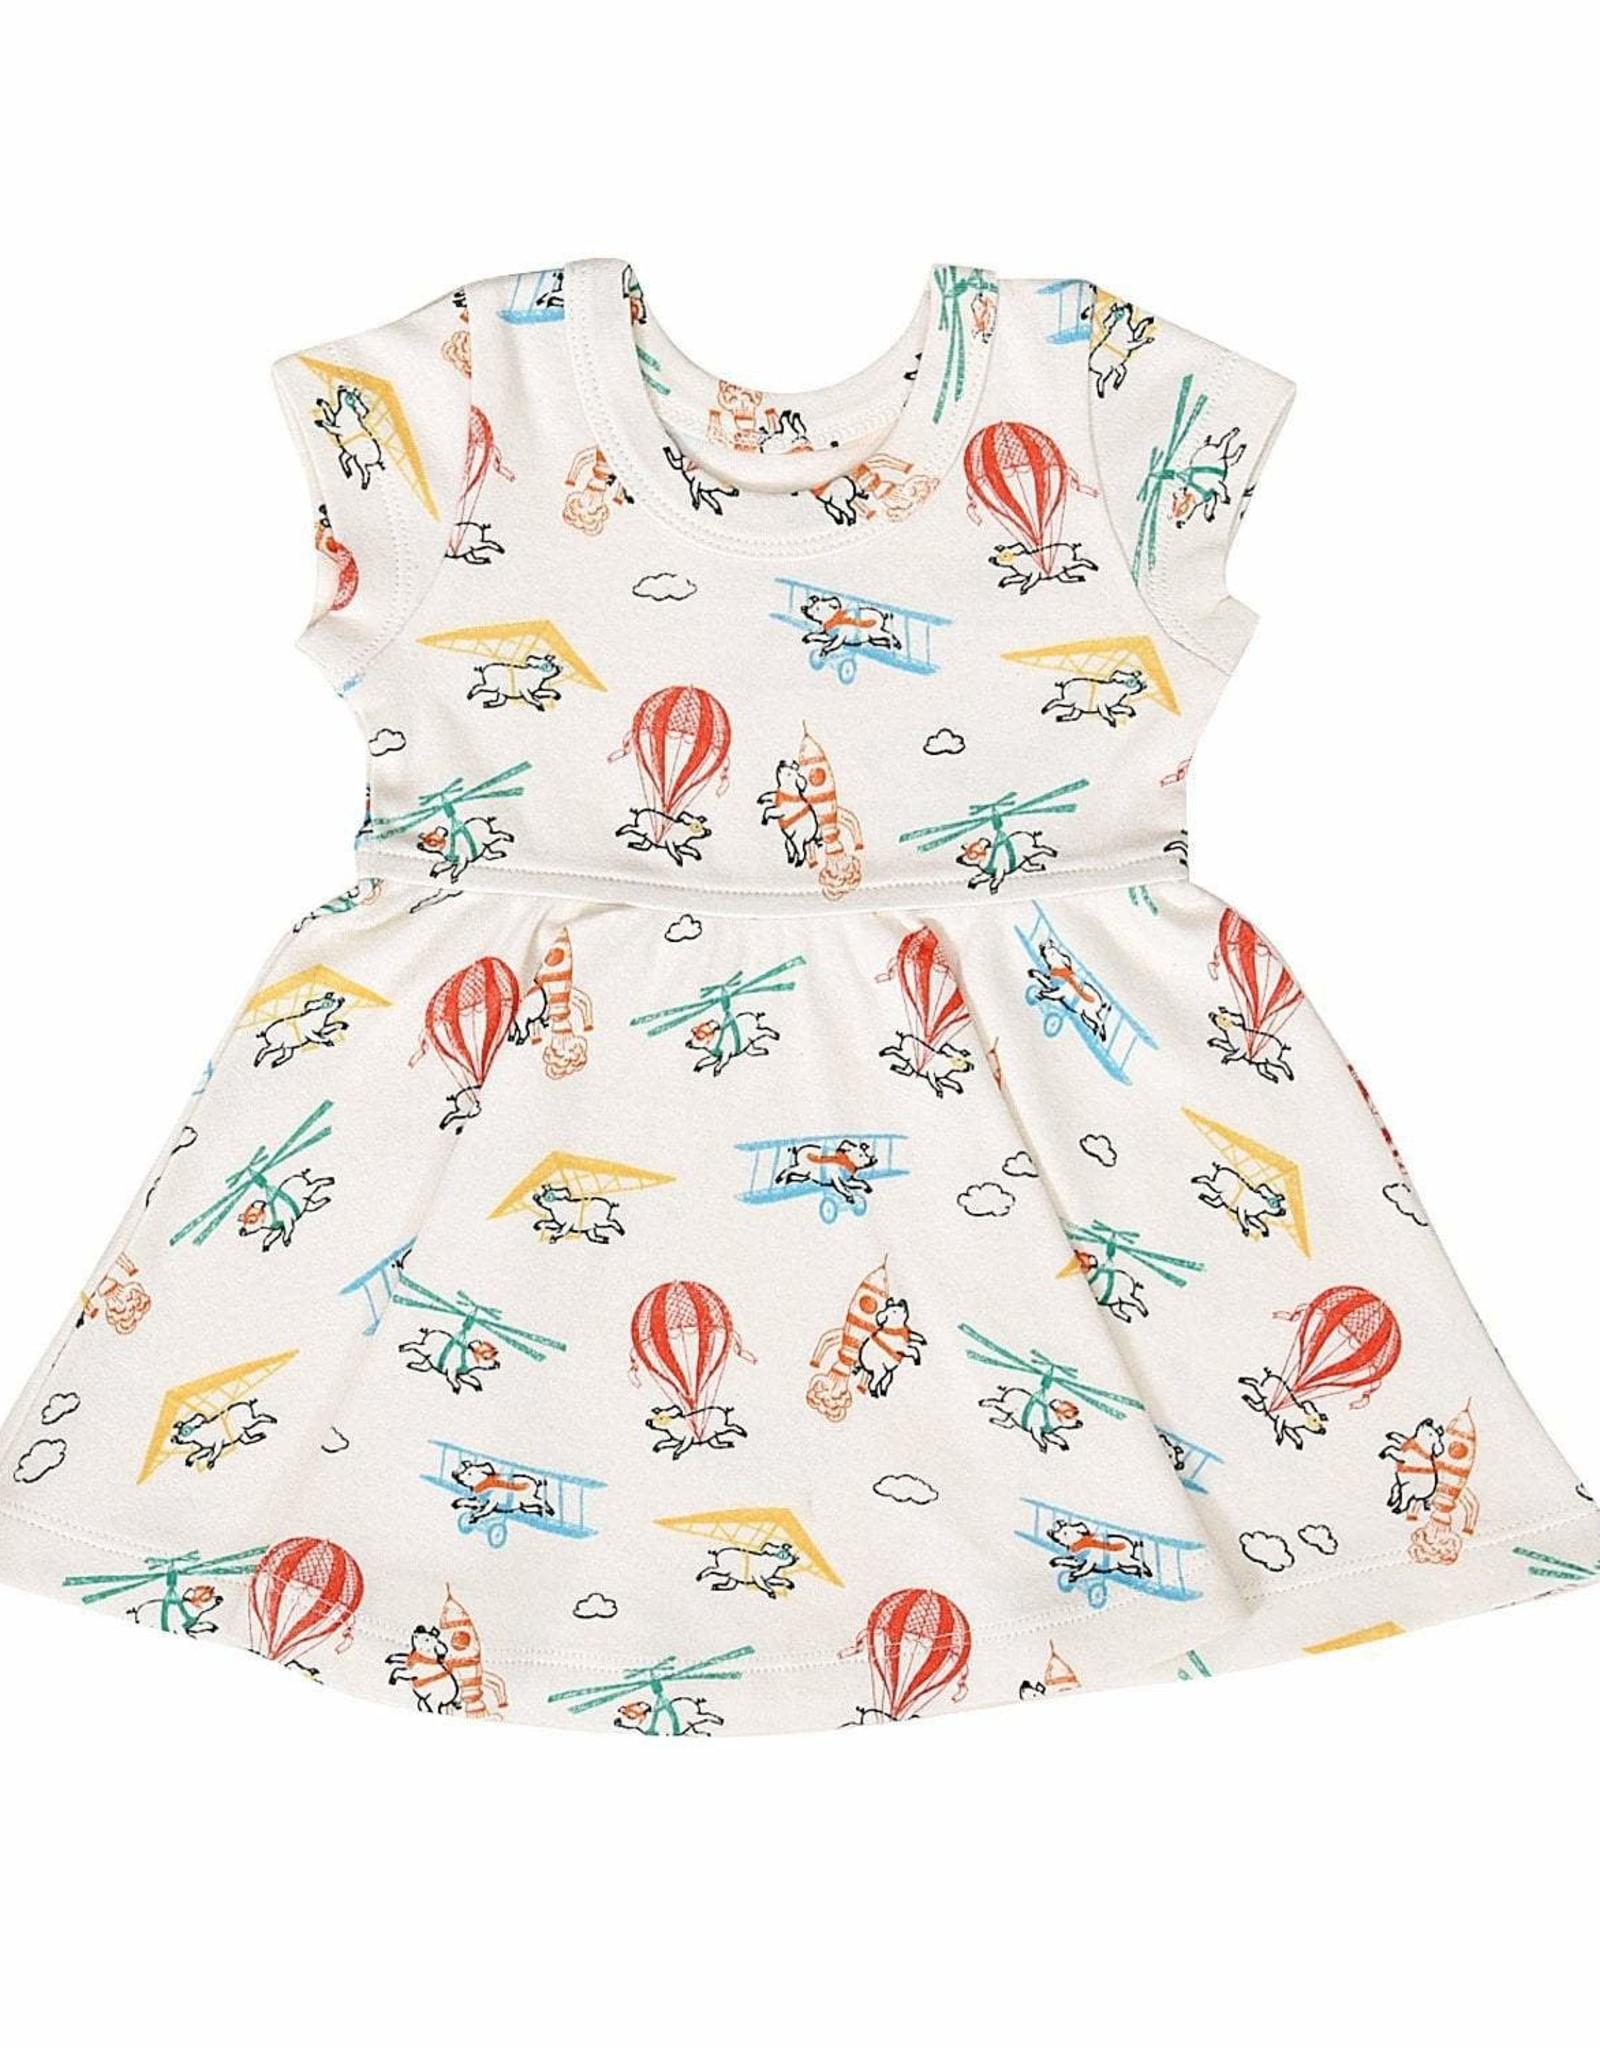 Finn & Emma Flying Pigs Twirl Dress